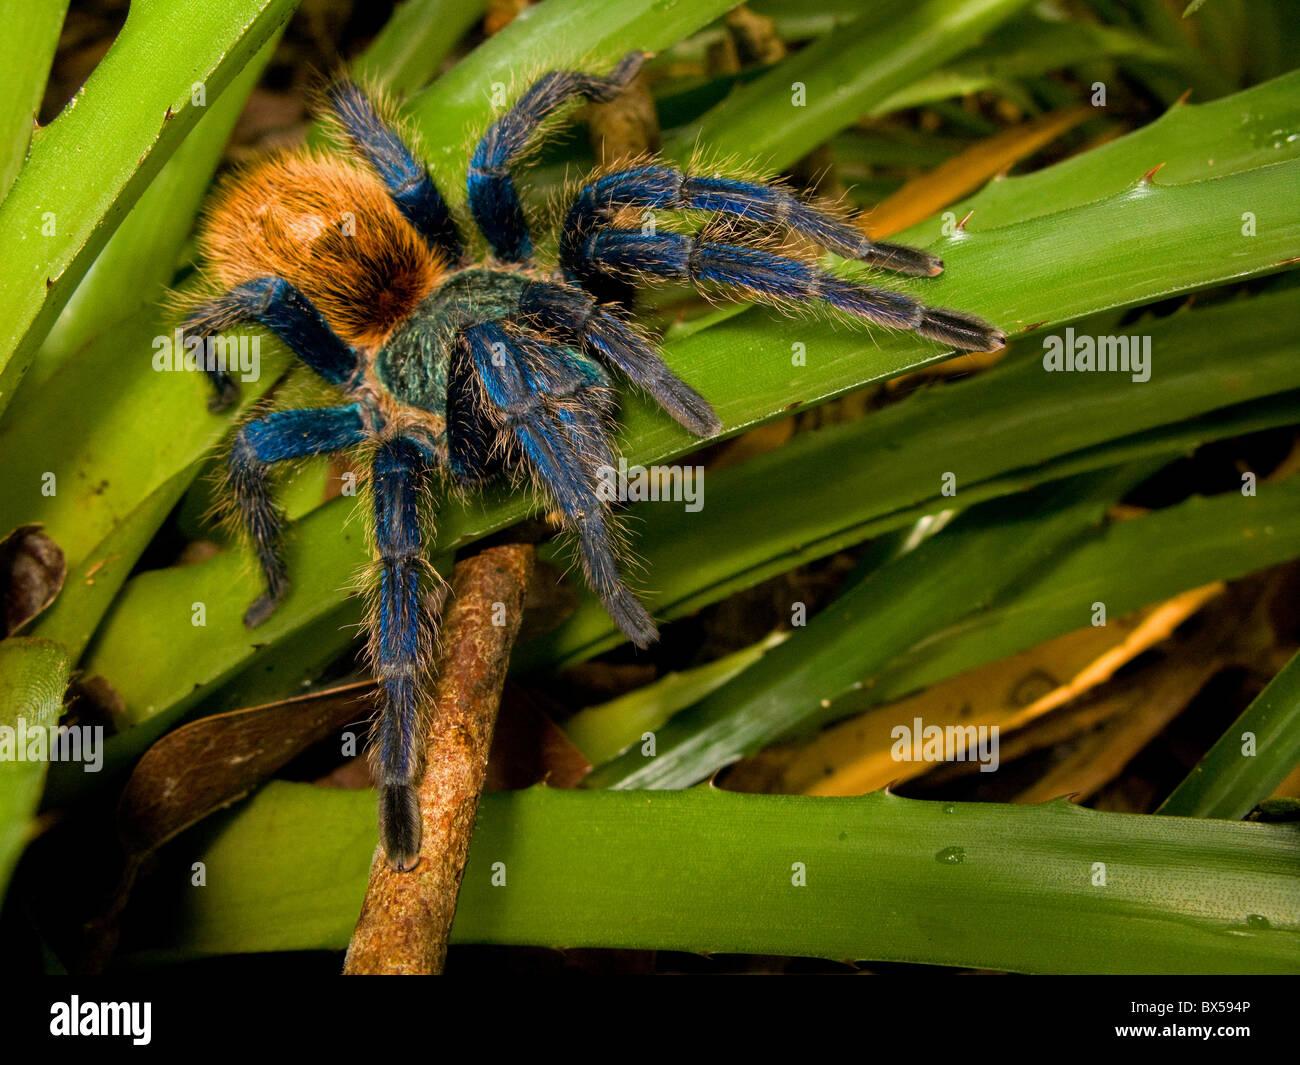 Blue tarantula spider from venezuela (Chromatopelma cyaneopubescens) Stock Photo